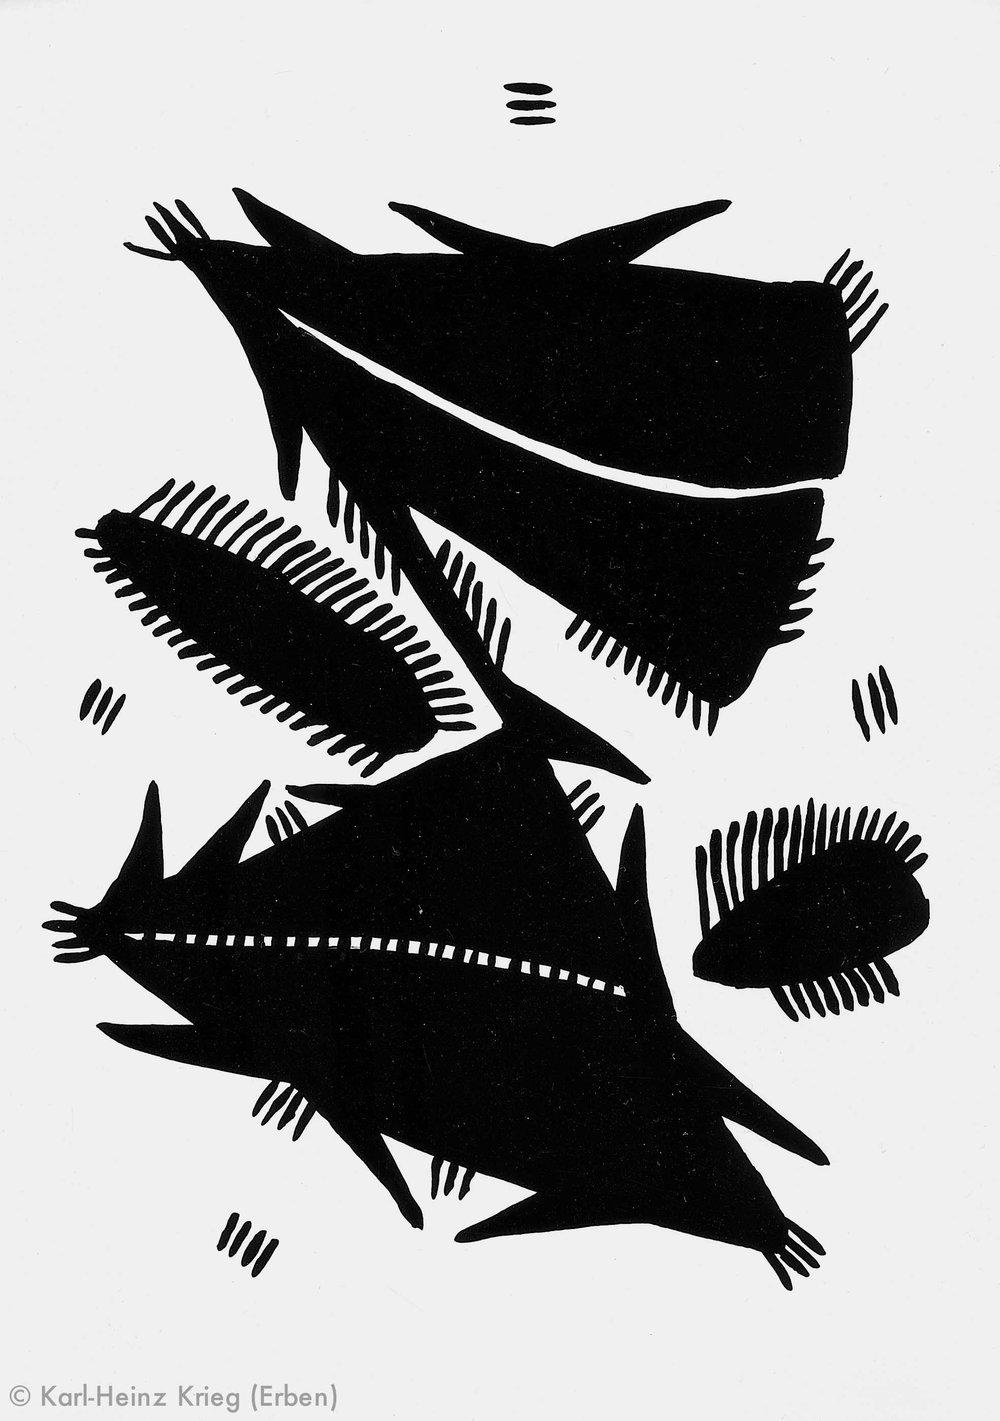 Akoi Zoumanigi Vielfüßler, Dreiecke, 1996 Acryl/Papier, grundiert 39,6 x 29,1 cm Werknr. 38-1996/73